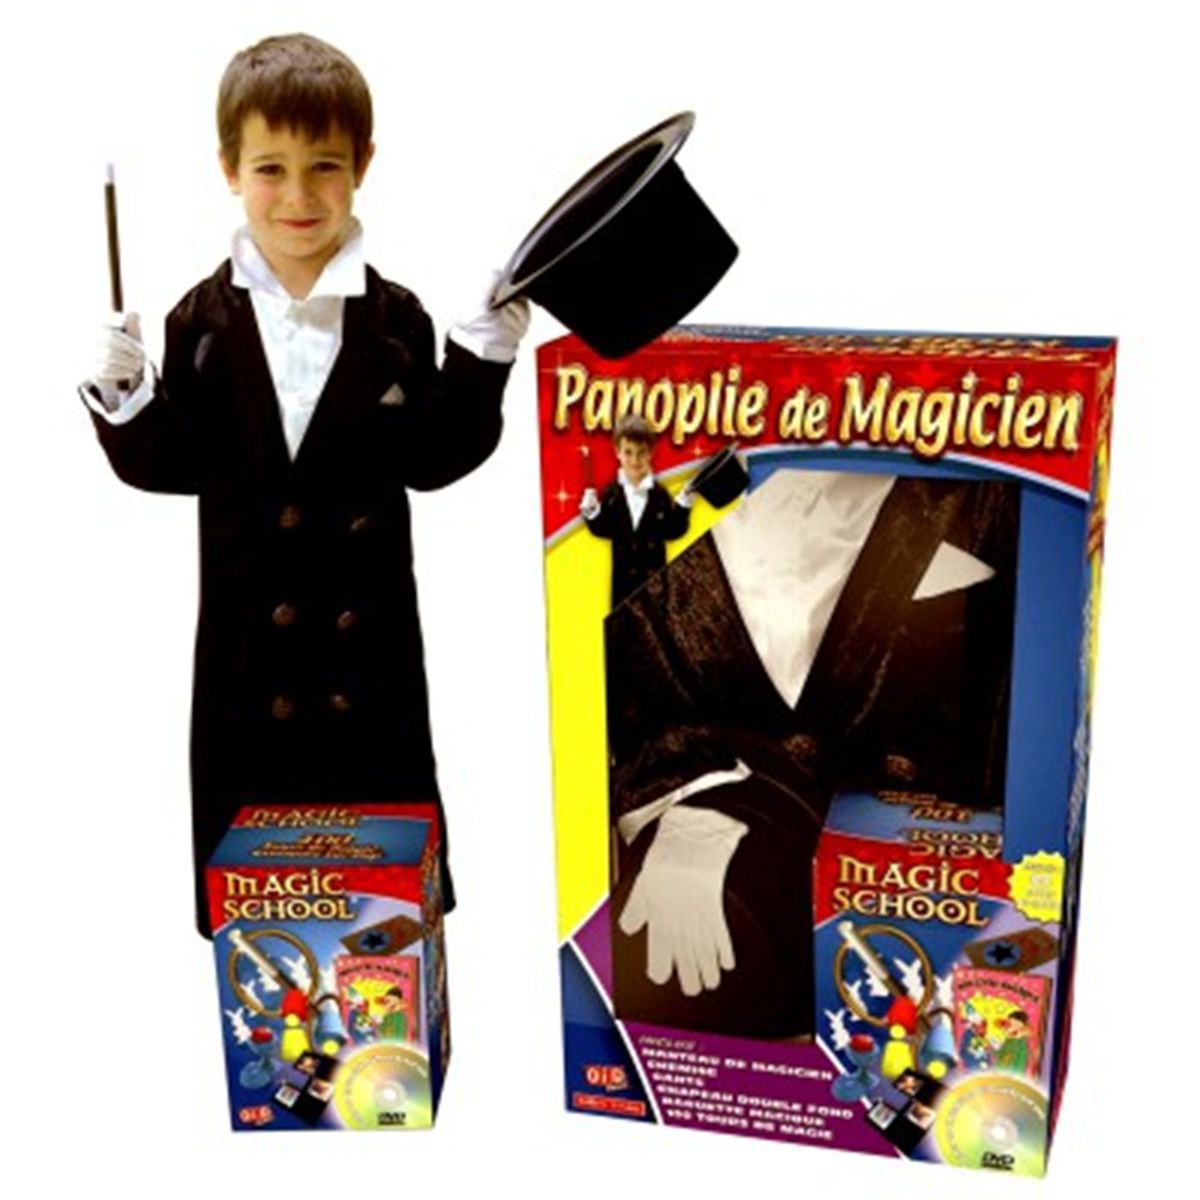 panoplie magicien